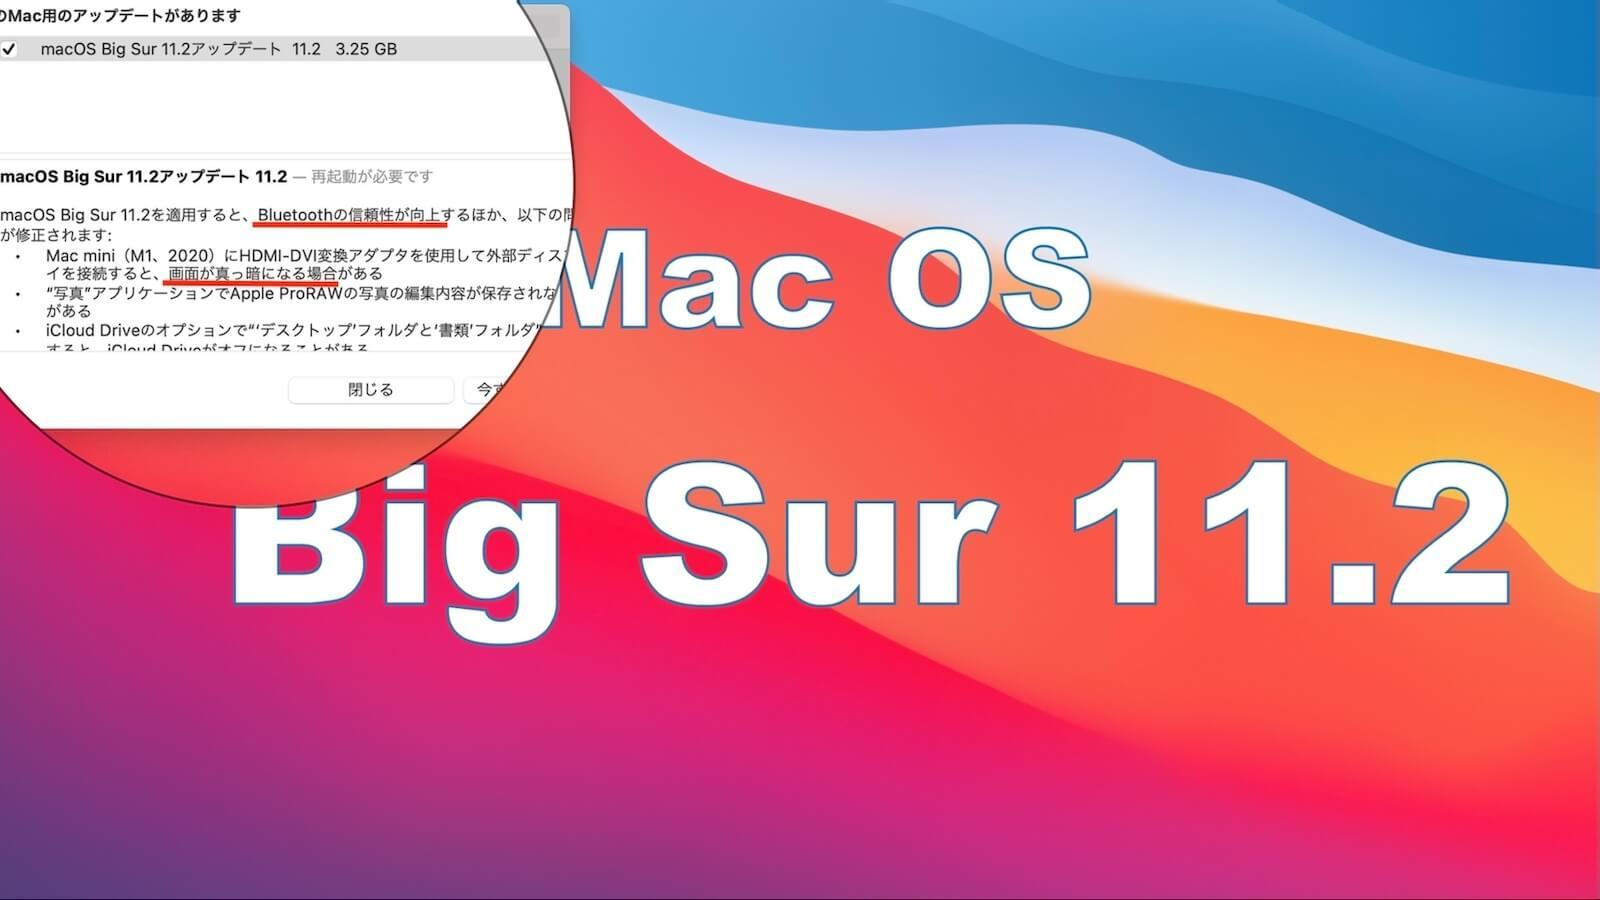 Capture updates for macOS Big Sur 11.2